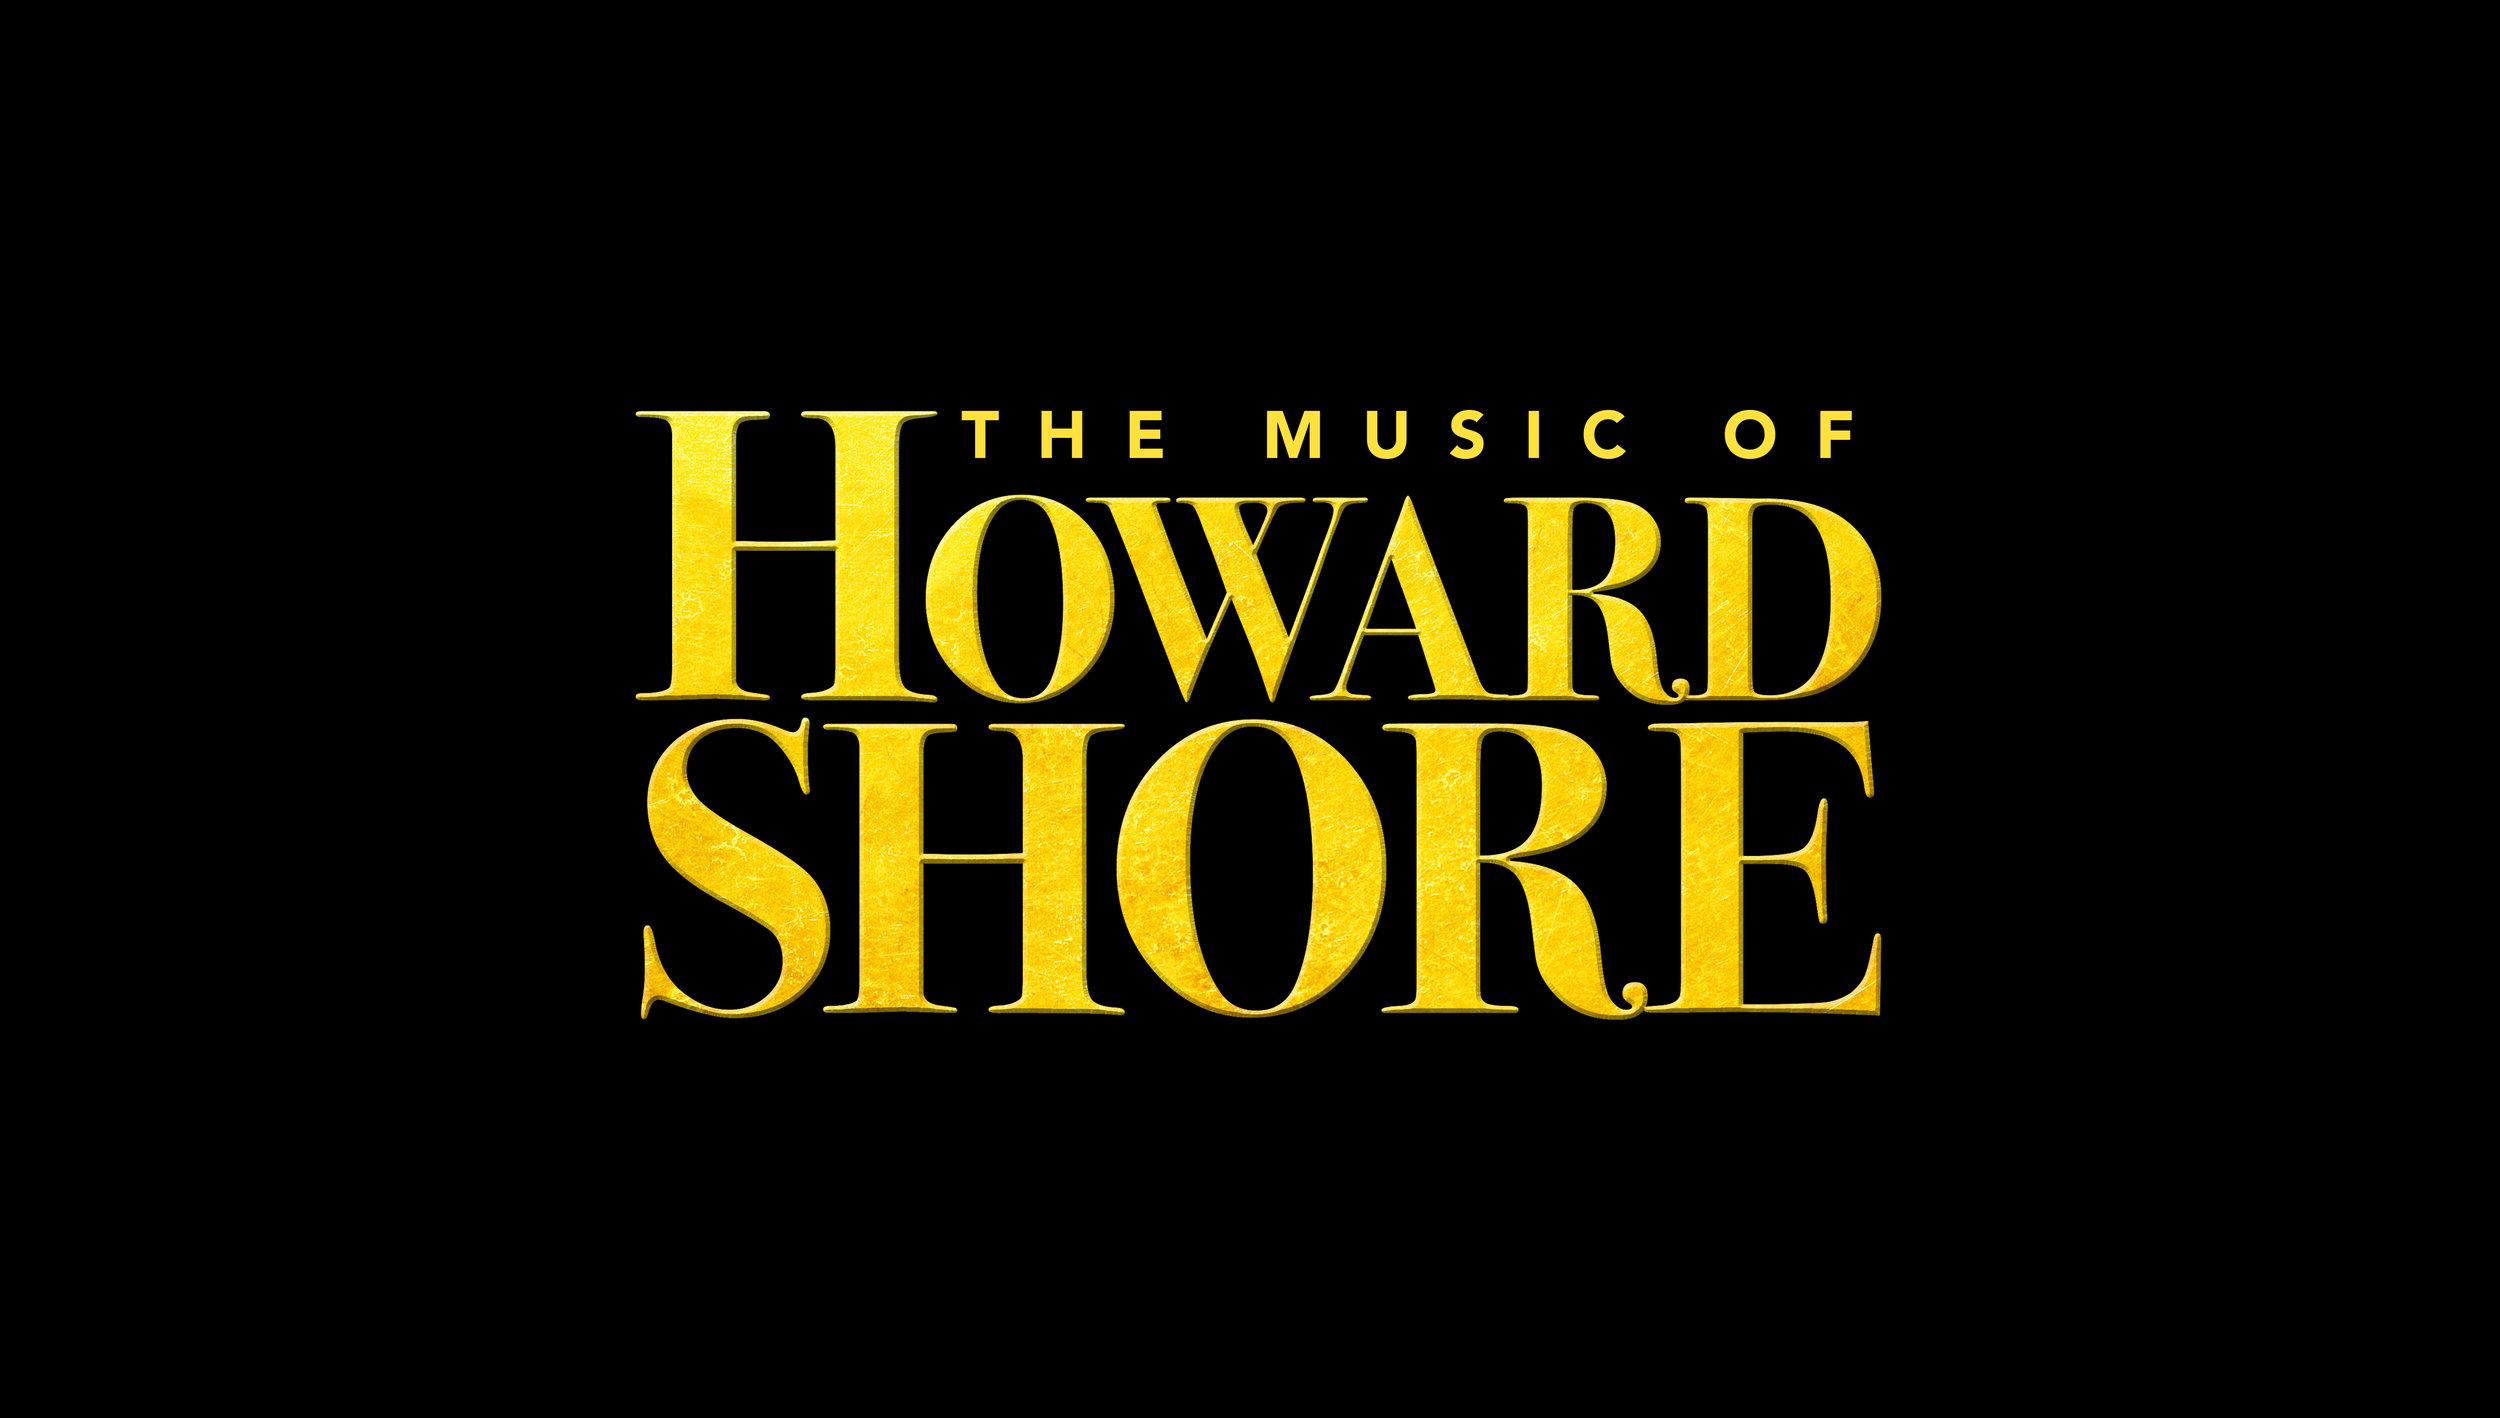 musicofhowardshore 2.jpg